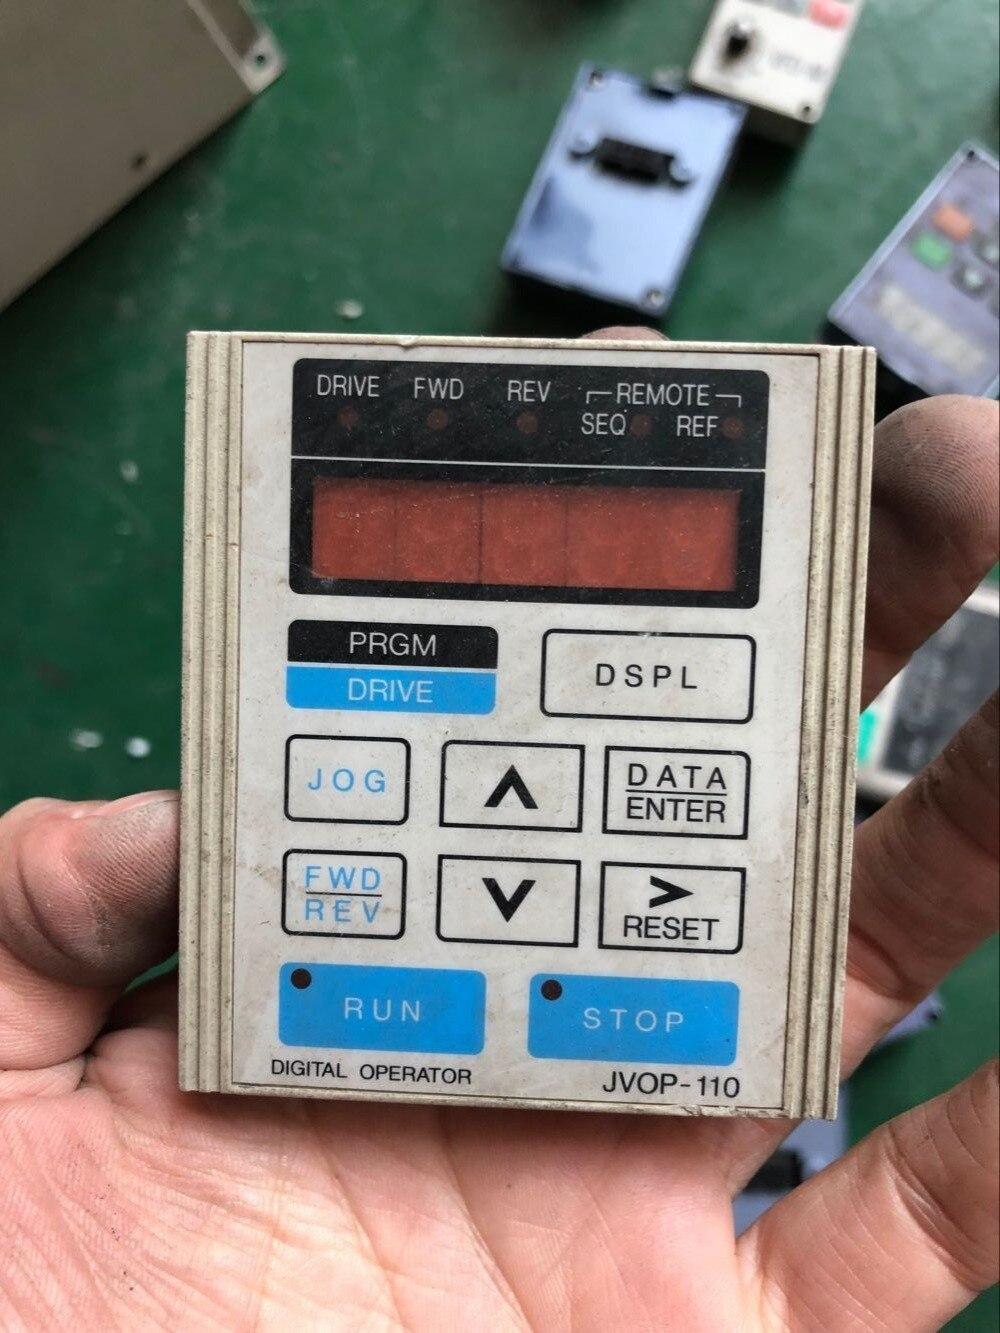 JVOP-110   inverter  Good appearance  90% new   ,90 days  warranty   , in stock  free shipping JVOP-110   inverter  Good appearance  90% new   ,90 days  warranty   , in stock  free shipping